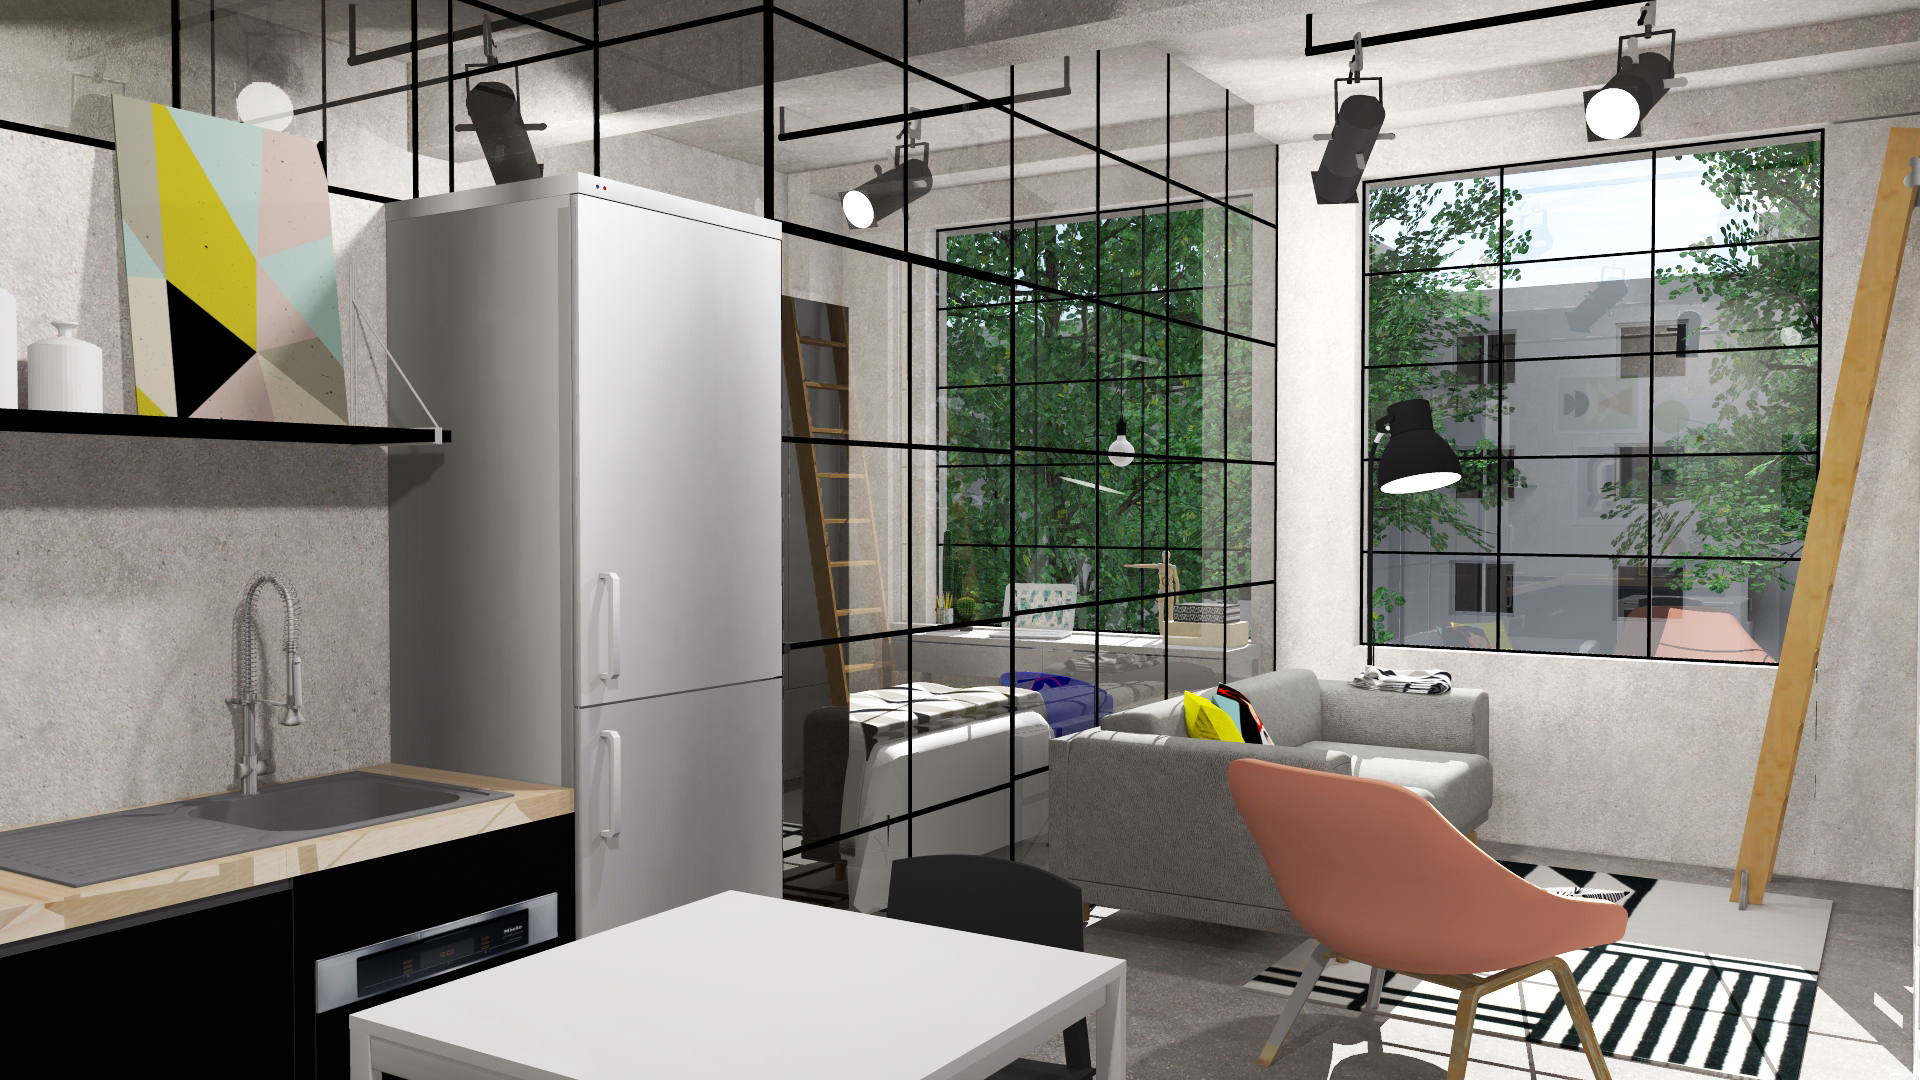 poke_interiordesign.jpg